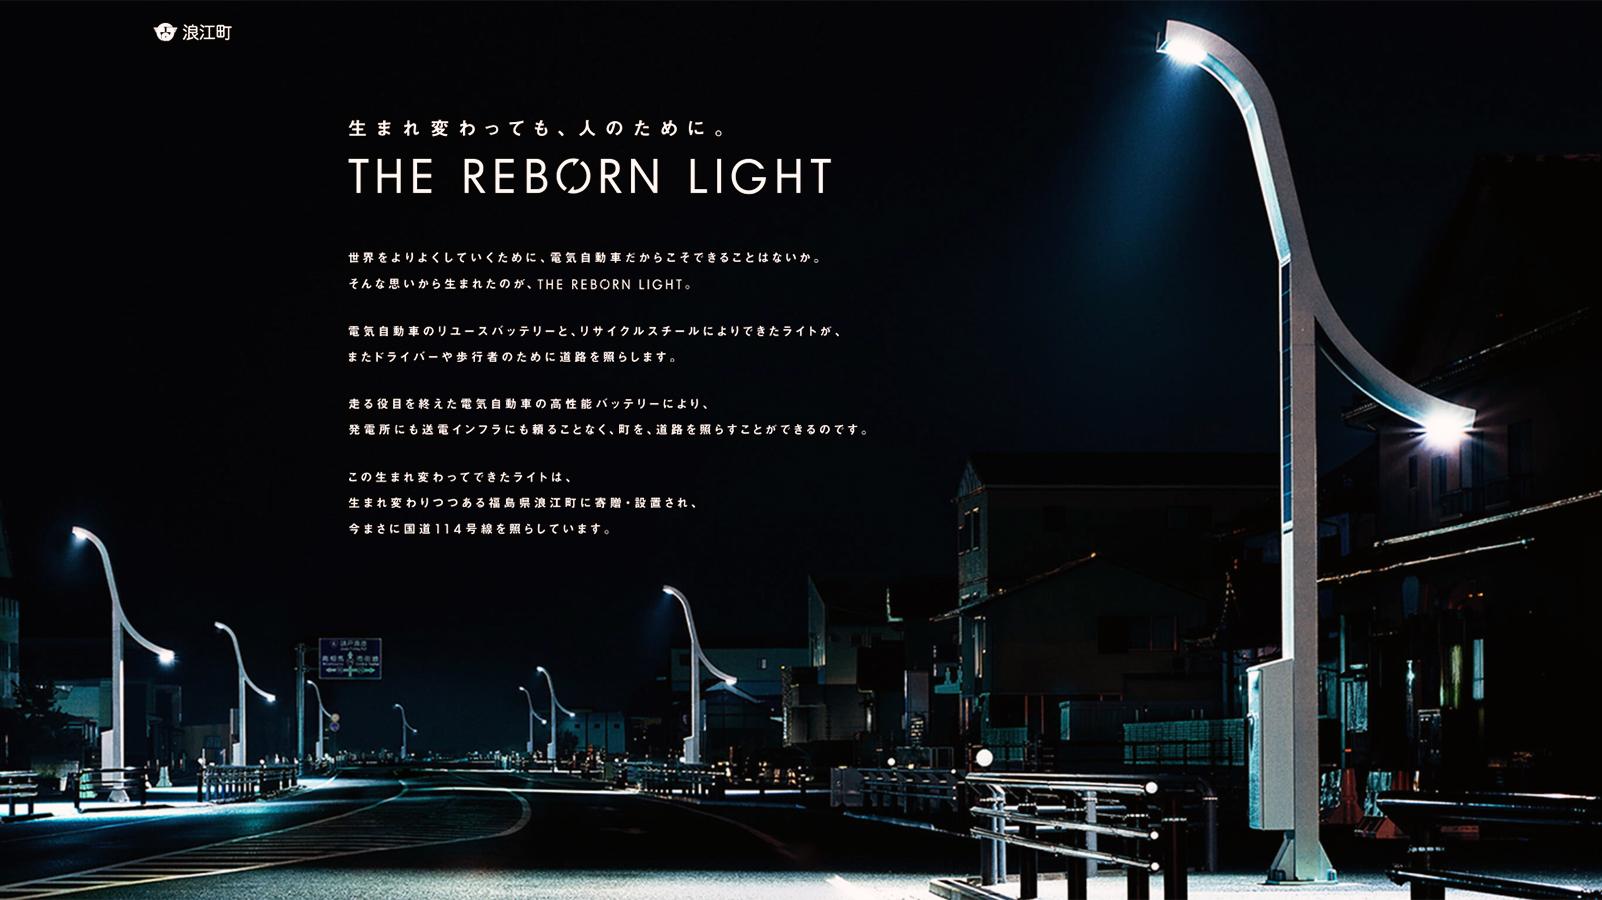 THE REBORN LIGHT